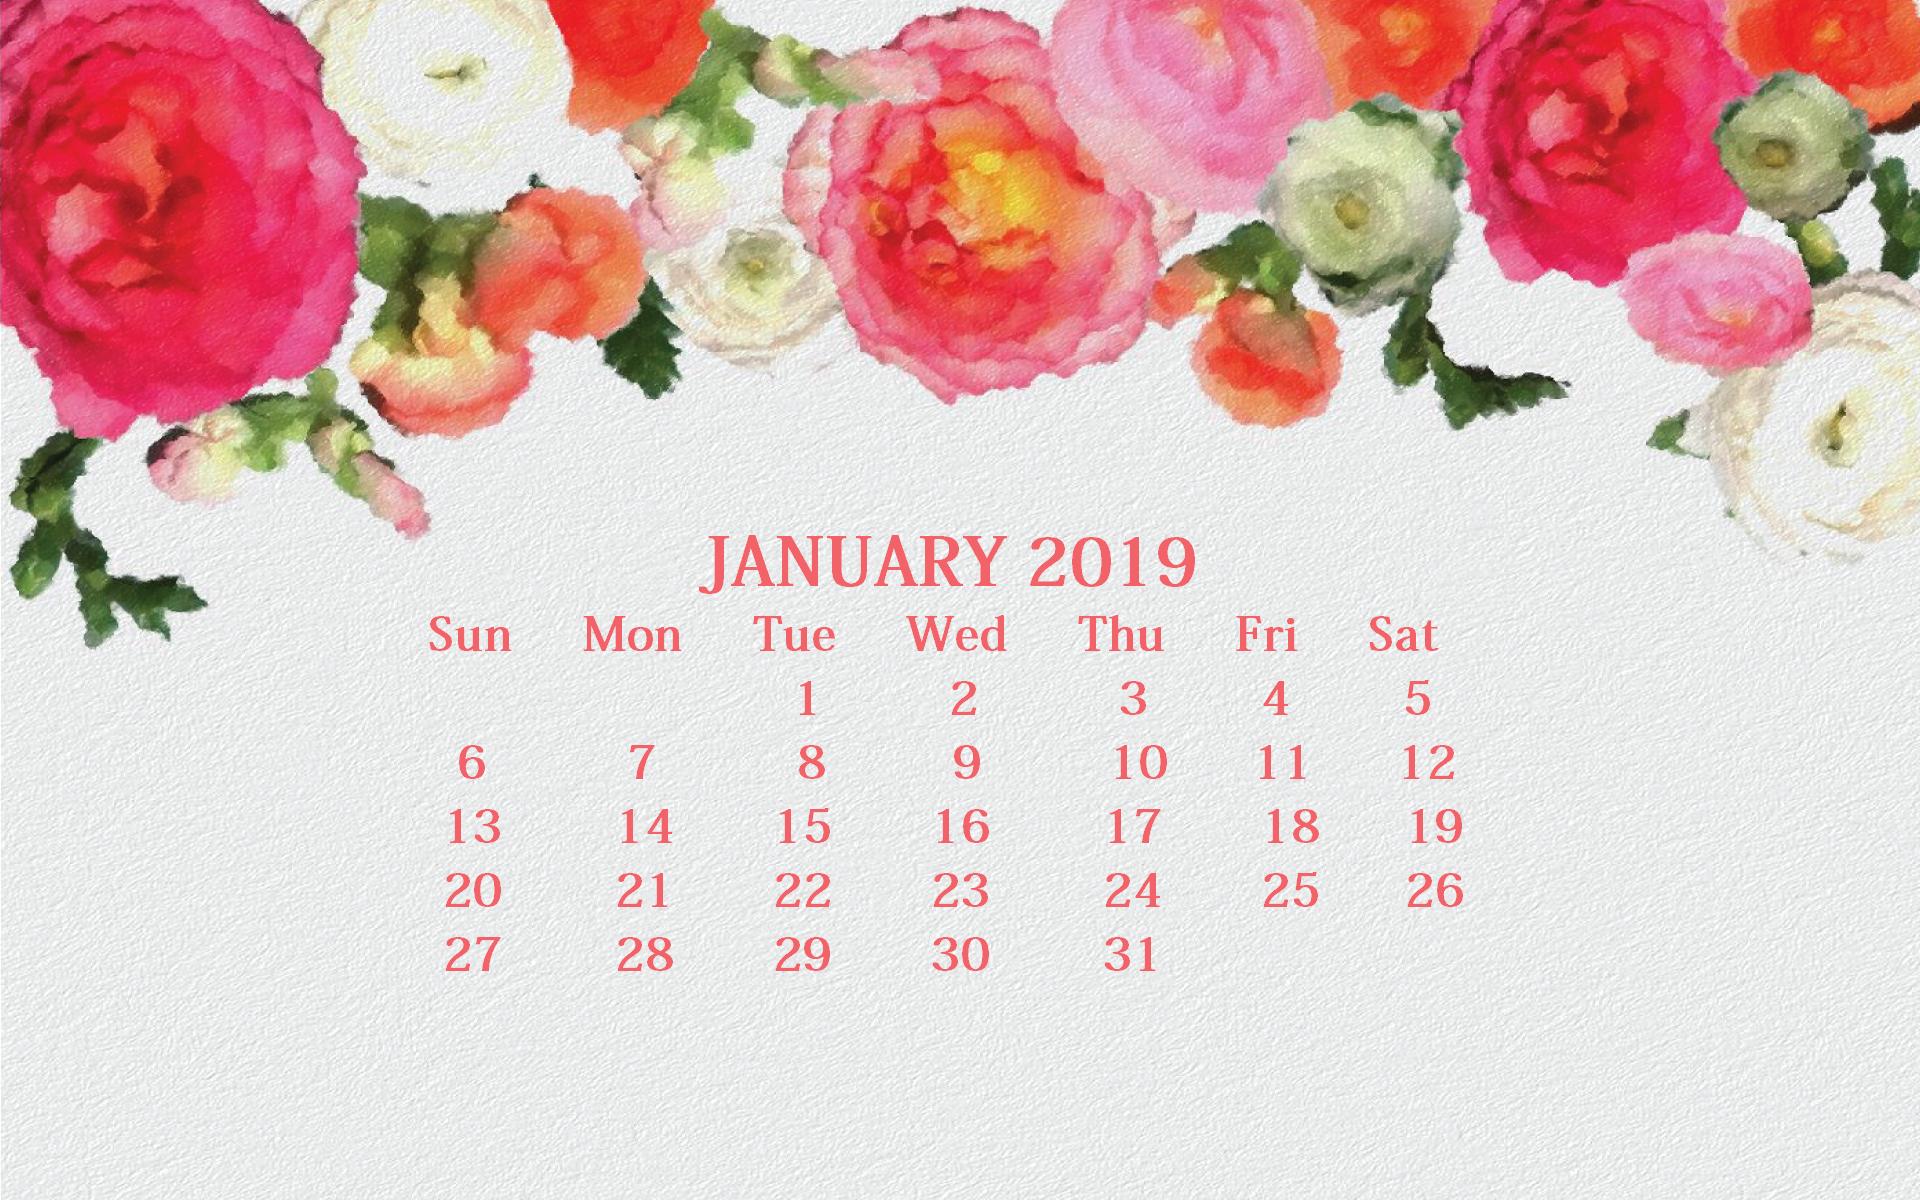 January 2019 Screensaver Backgrounds Max Calendars 1920x1200